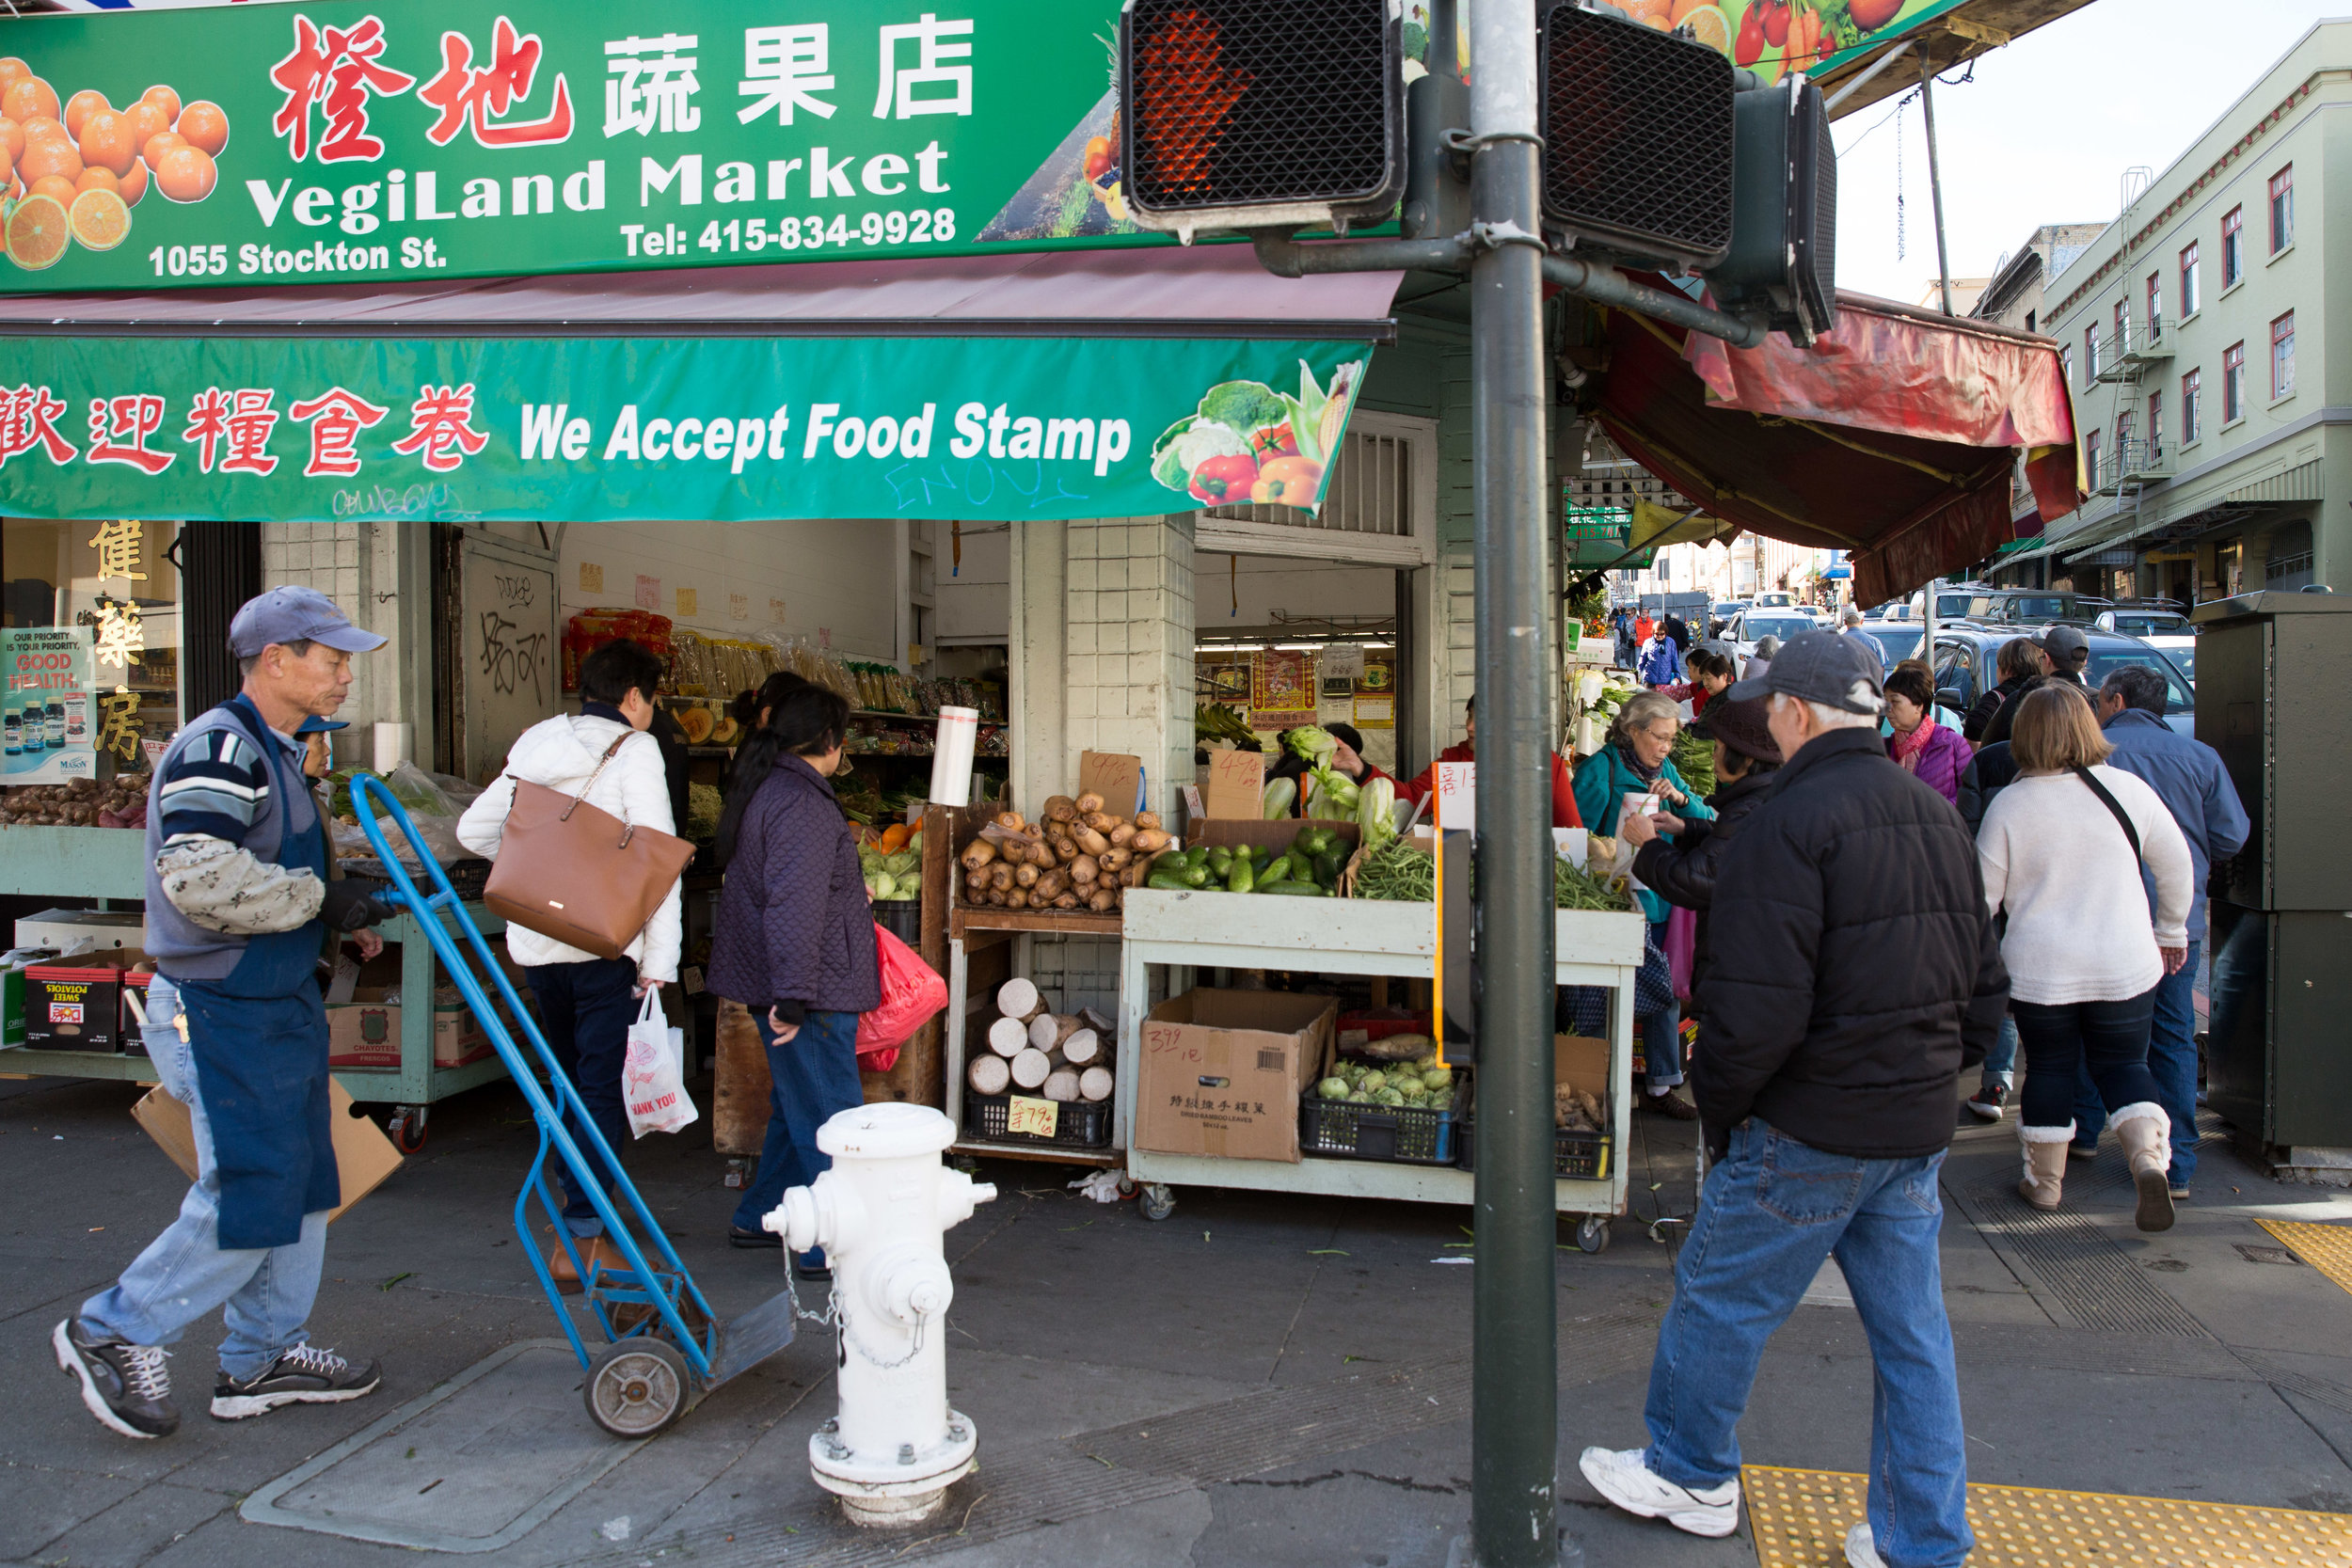 Vegiland Market橙地蘇果店